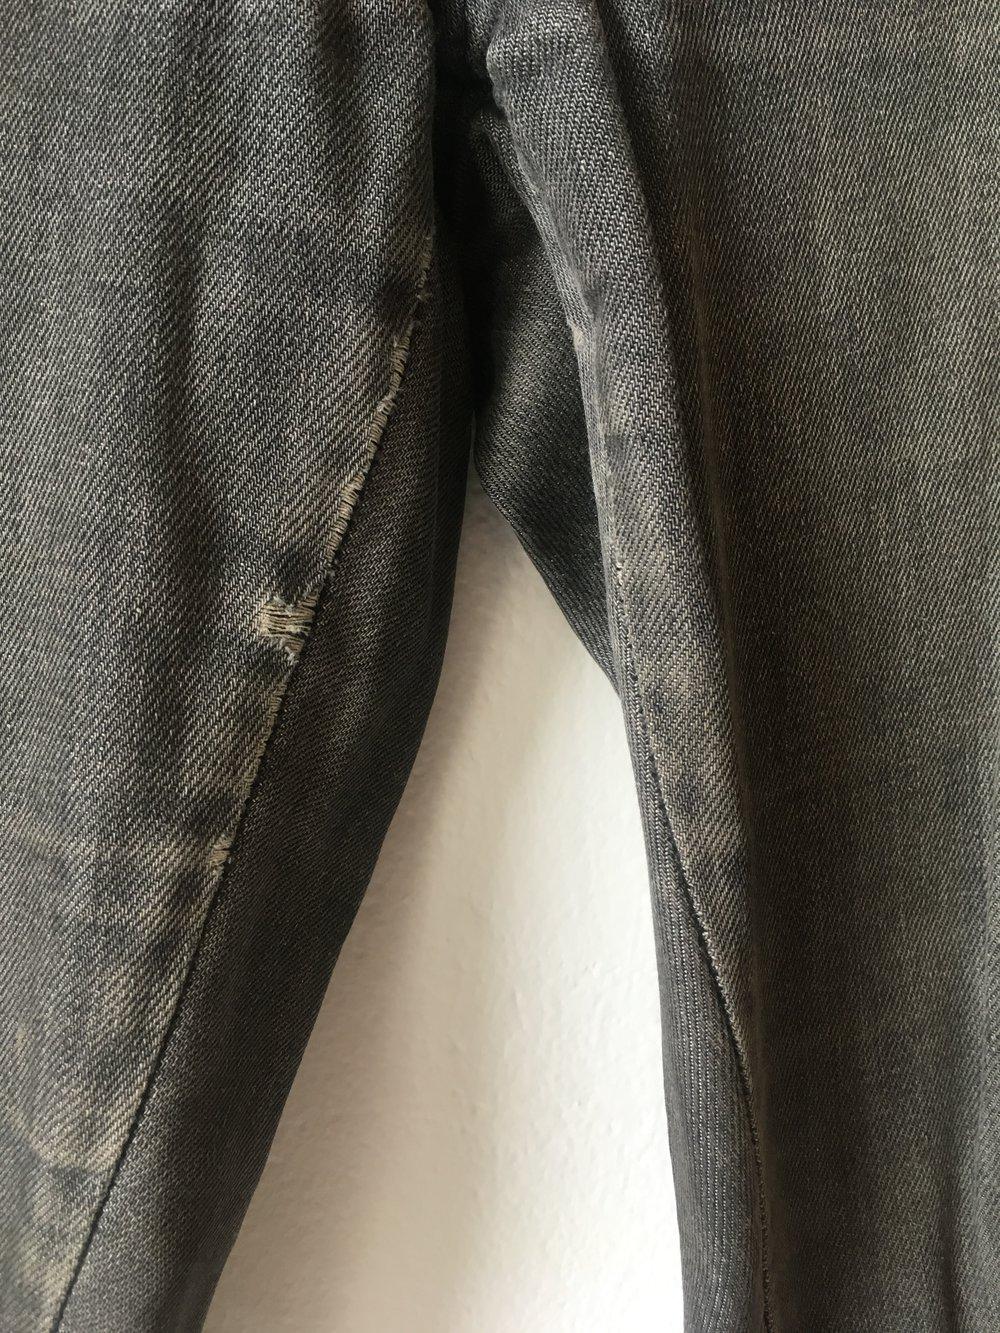 ... Miss Sixty Jeans Judy M Grau Gr.27 DENIM Straight Distressed Used Look  ... a97c1c76e6